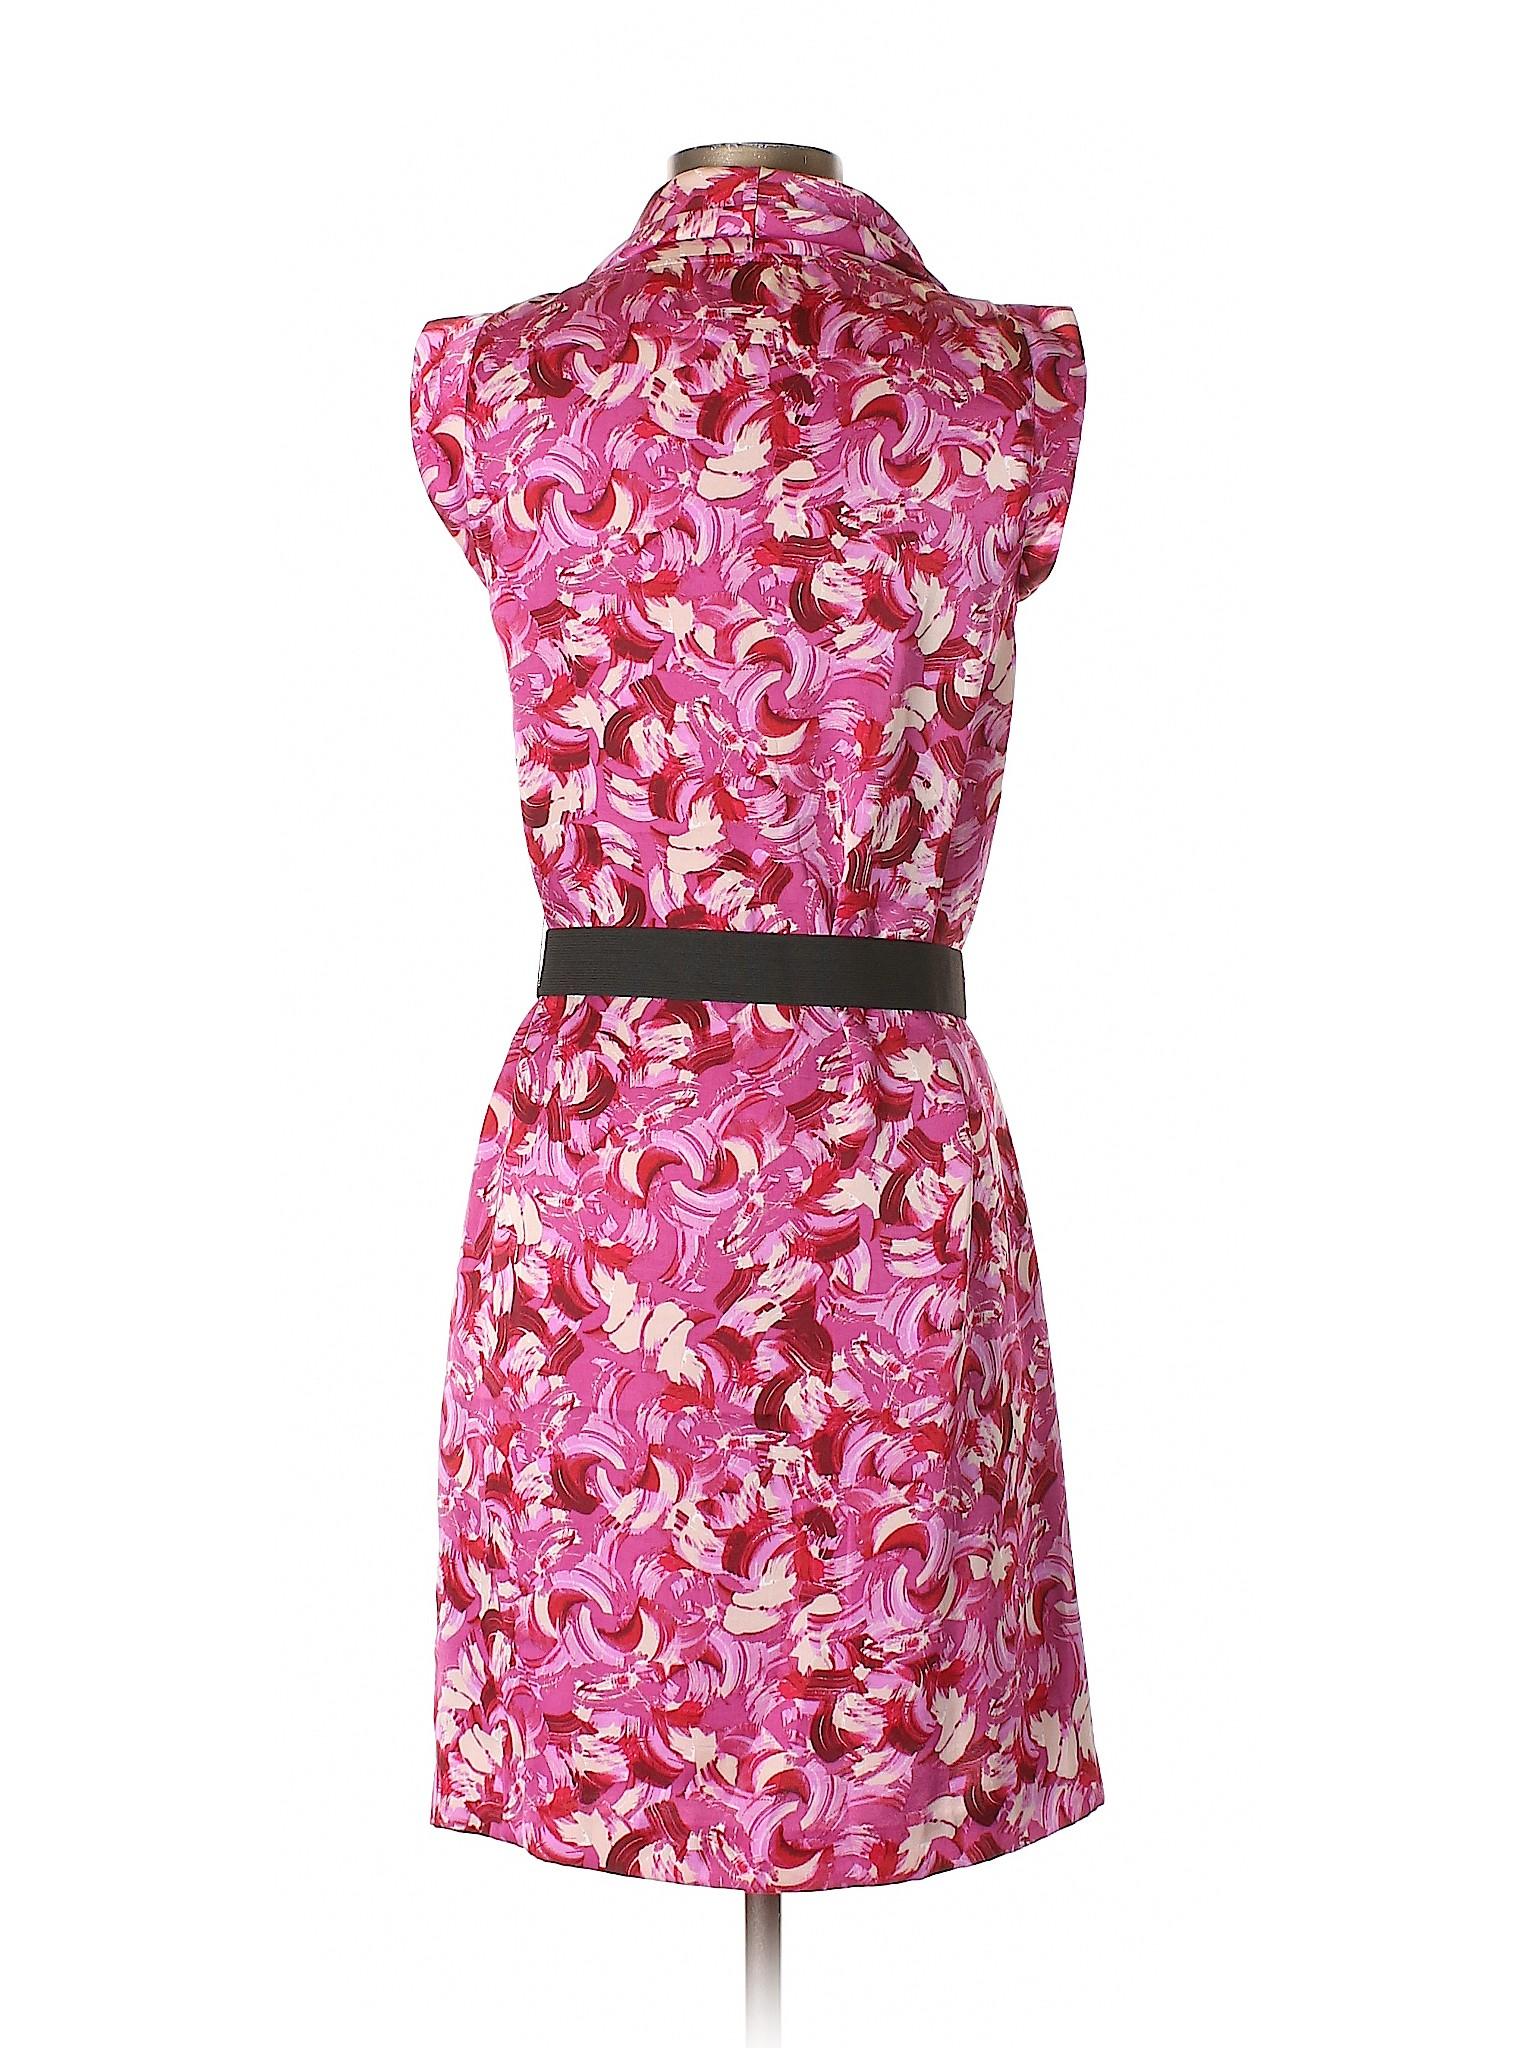 Dress Taylor LOFT Selling Ann Casual Ya6ARq